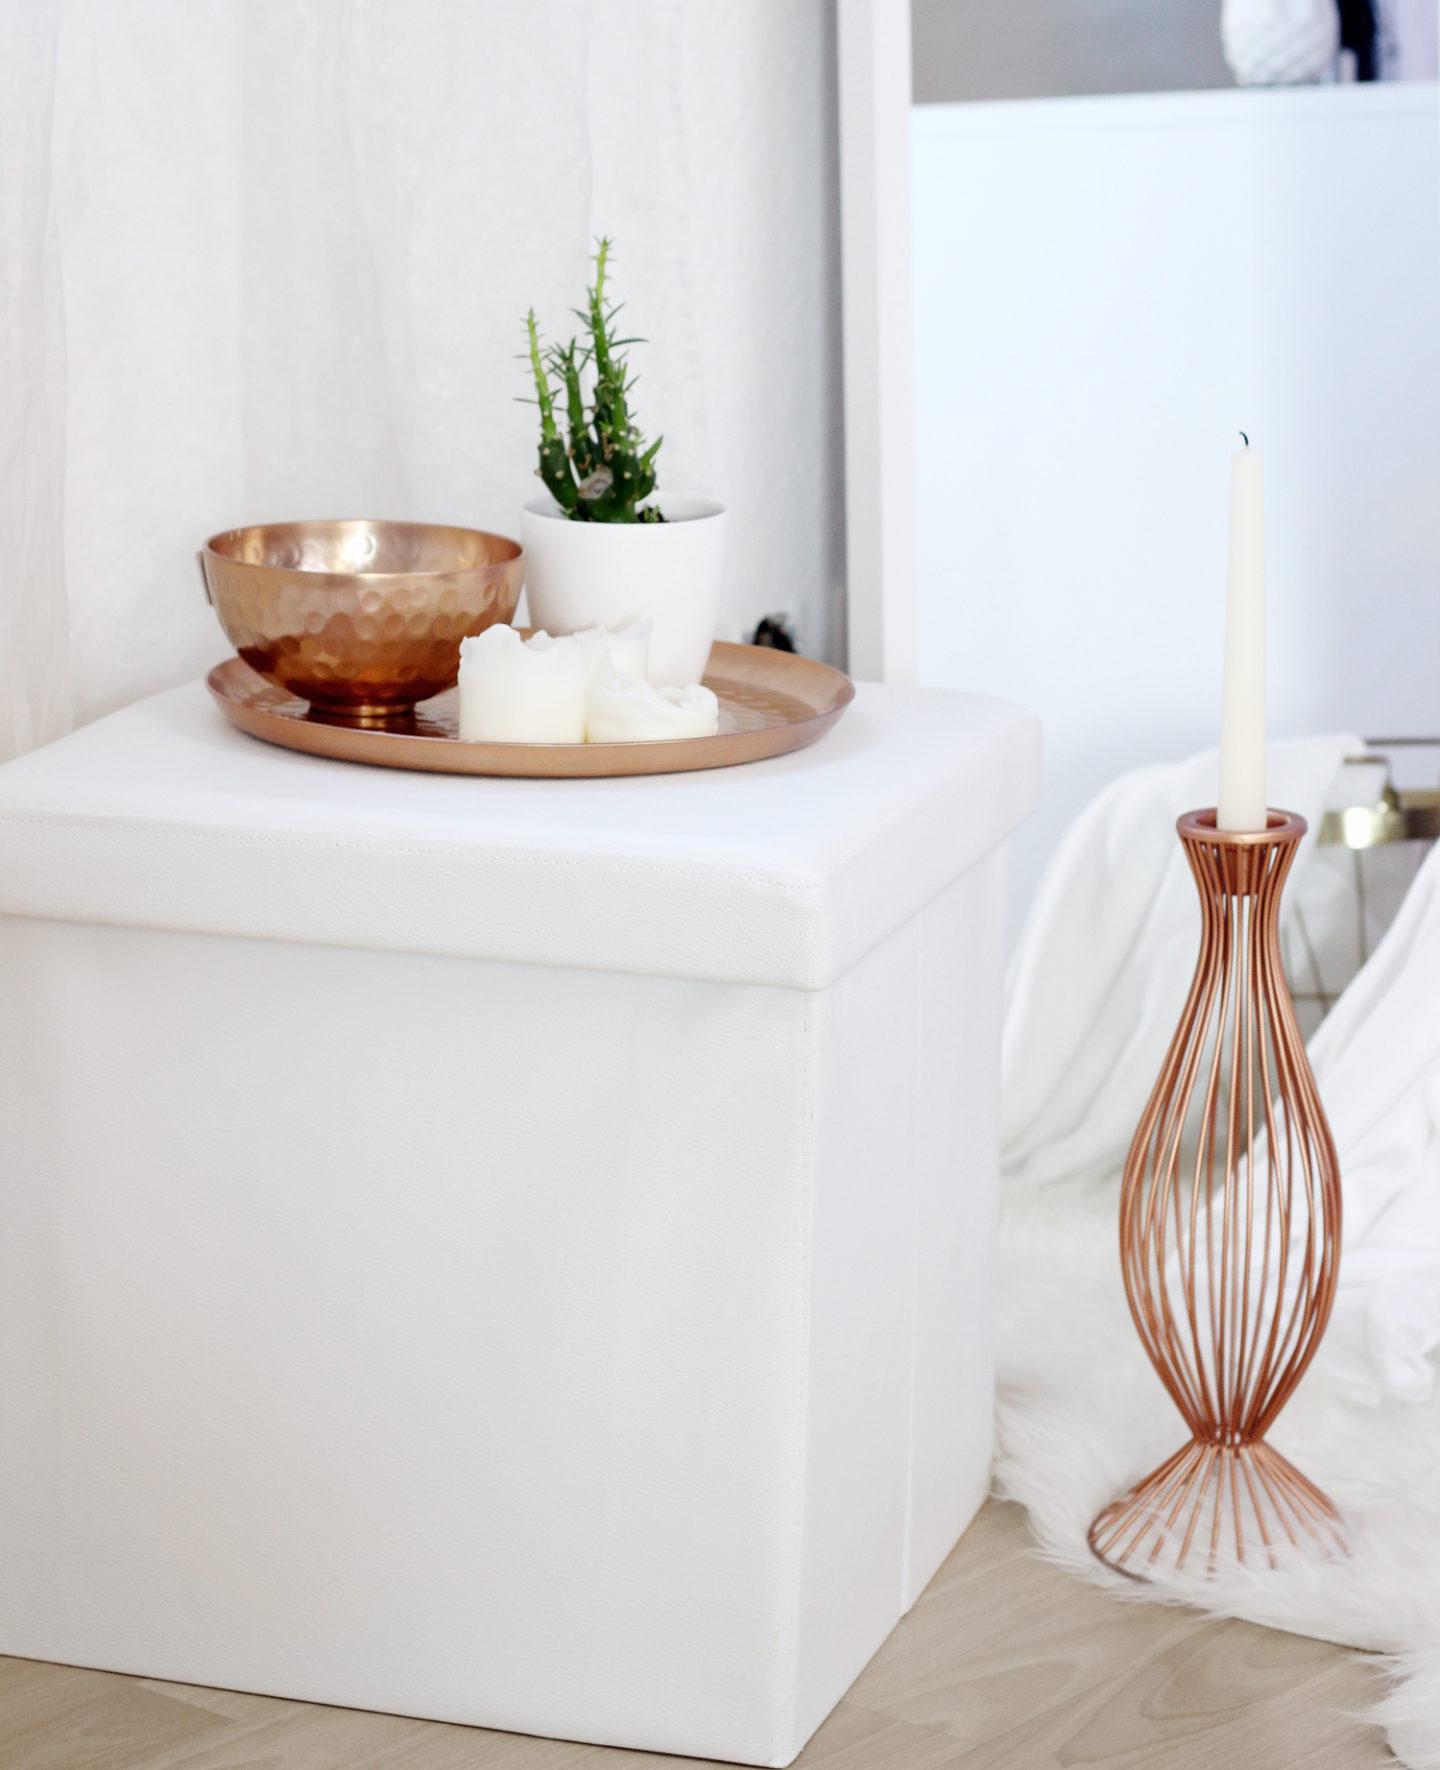 deko ikea beautiful gallery with deko ikea affordable. Black Bedroom Furniture Sets. Home Design Ideas